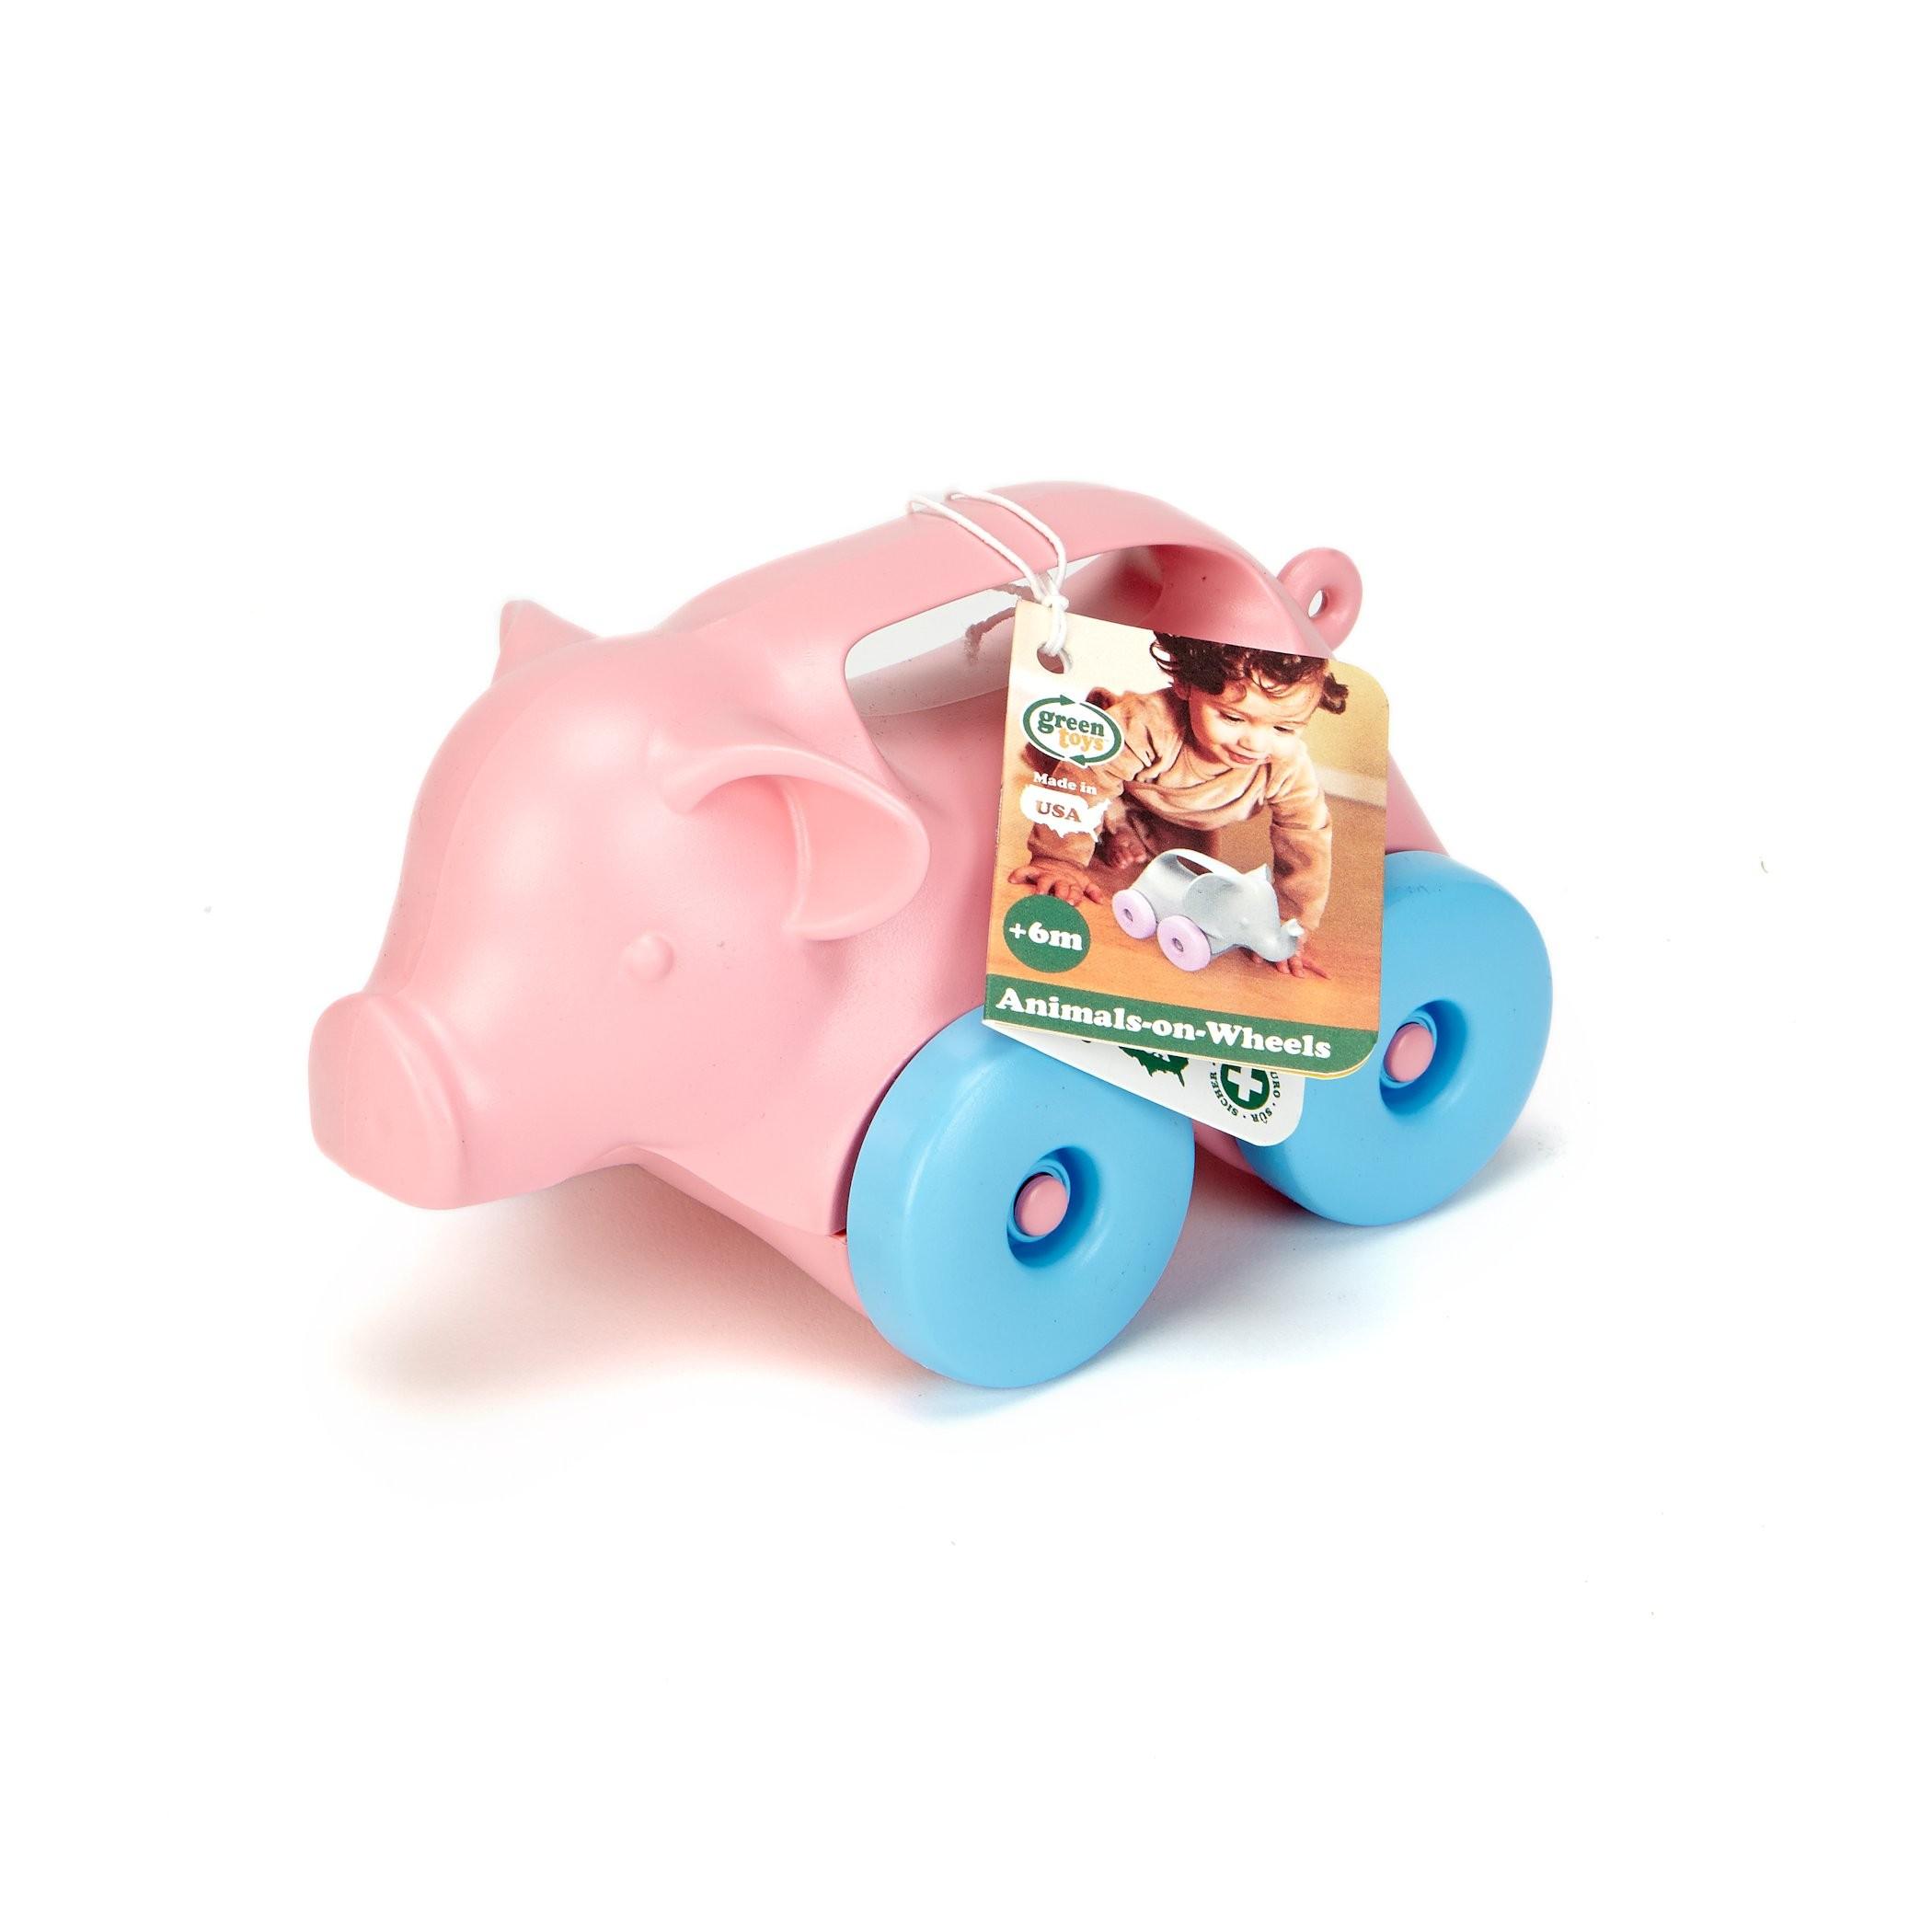 Green Toys: Pig-on-Wheels $5.39, Airplane $7.07, Salad Set $7.42 @Amazon